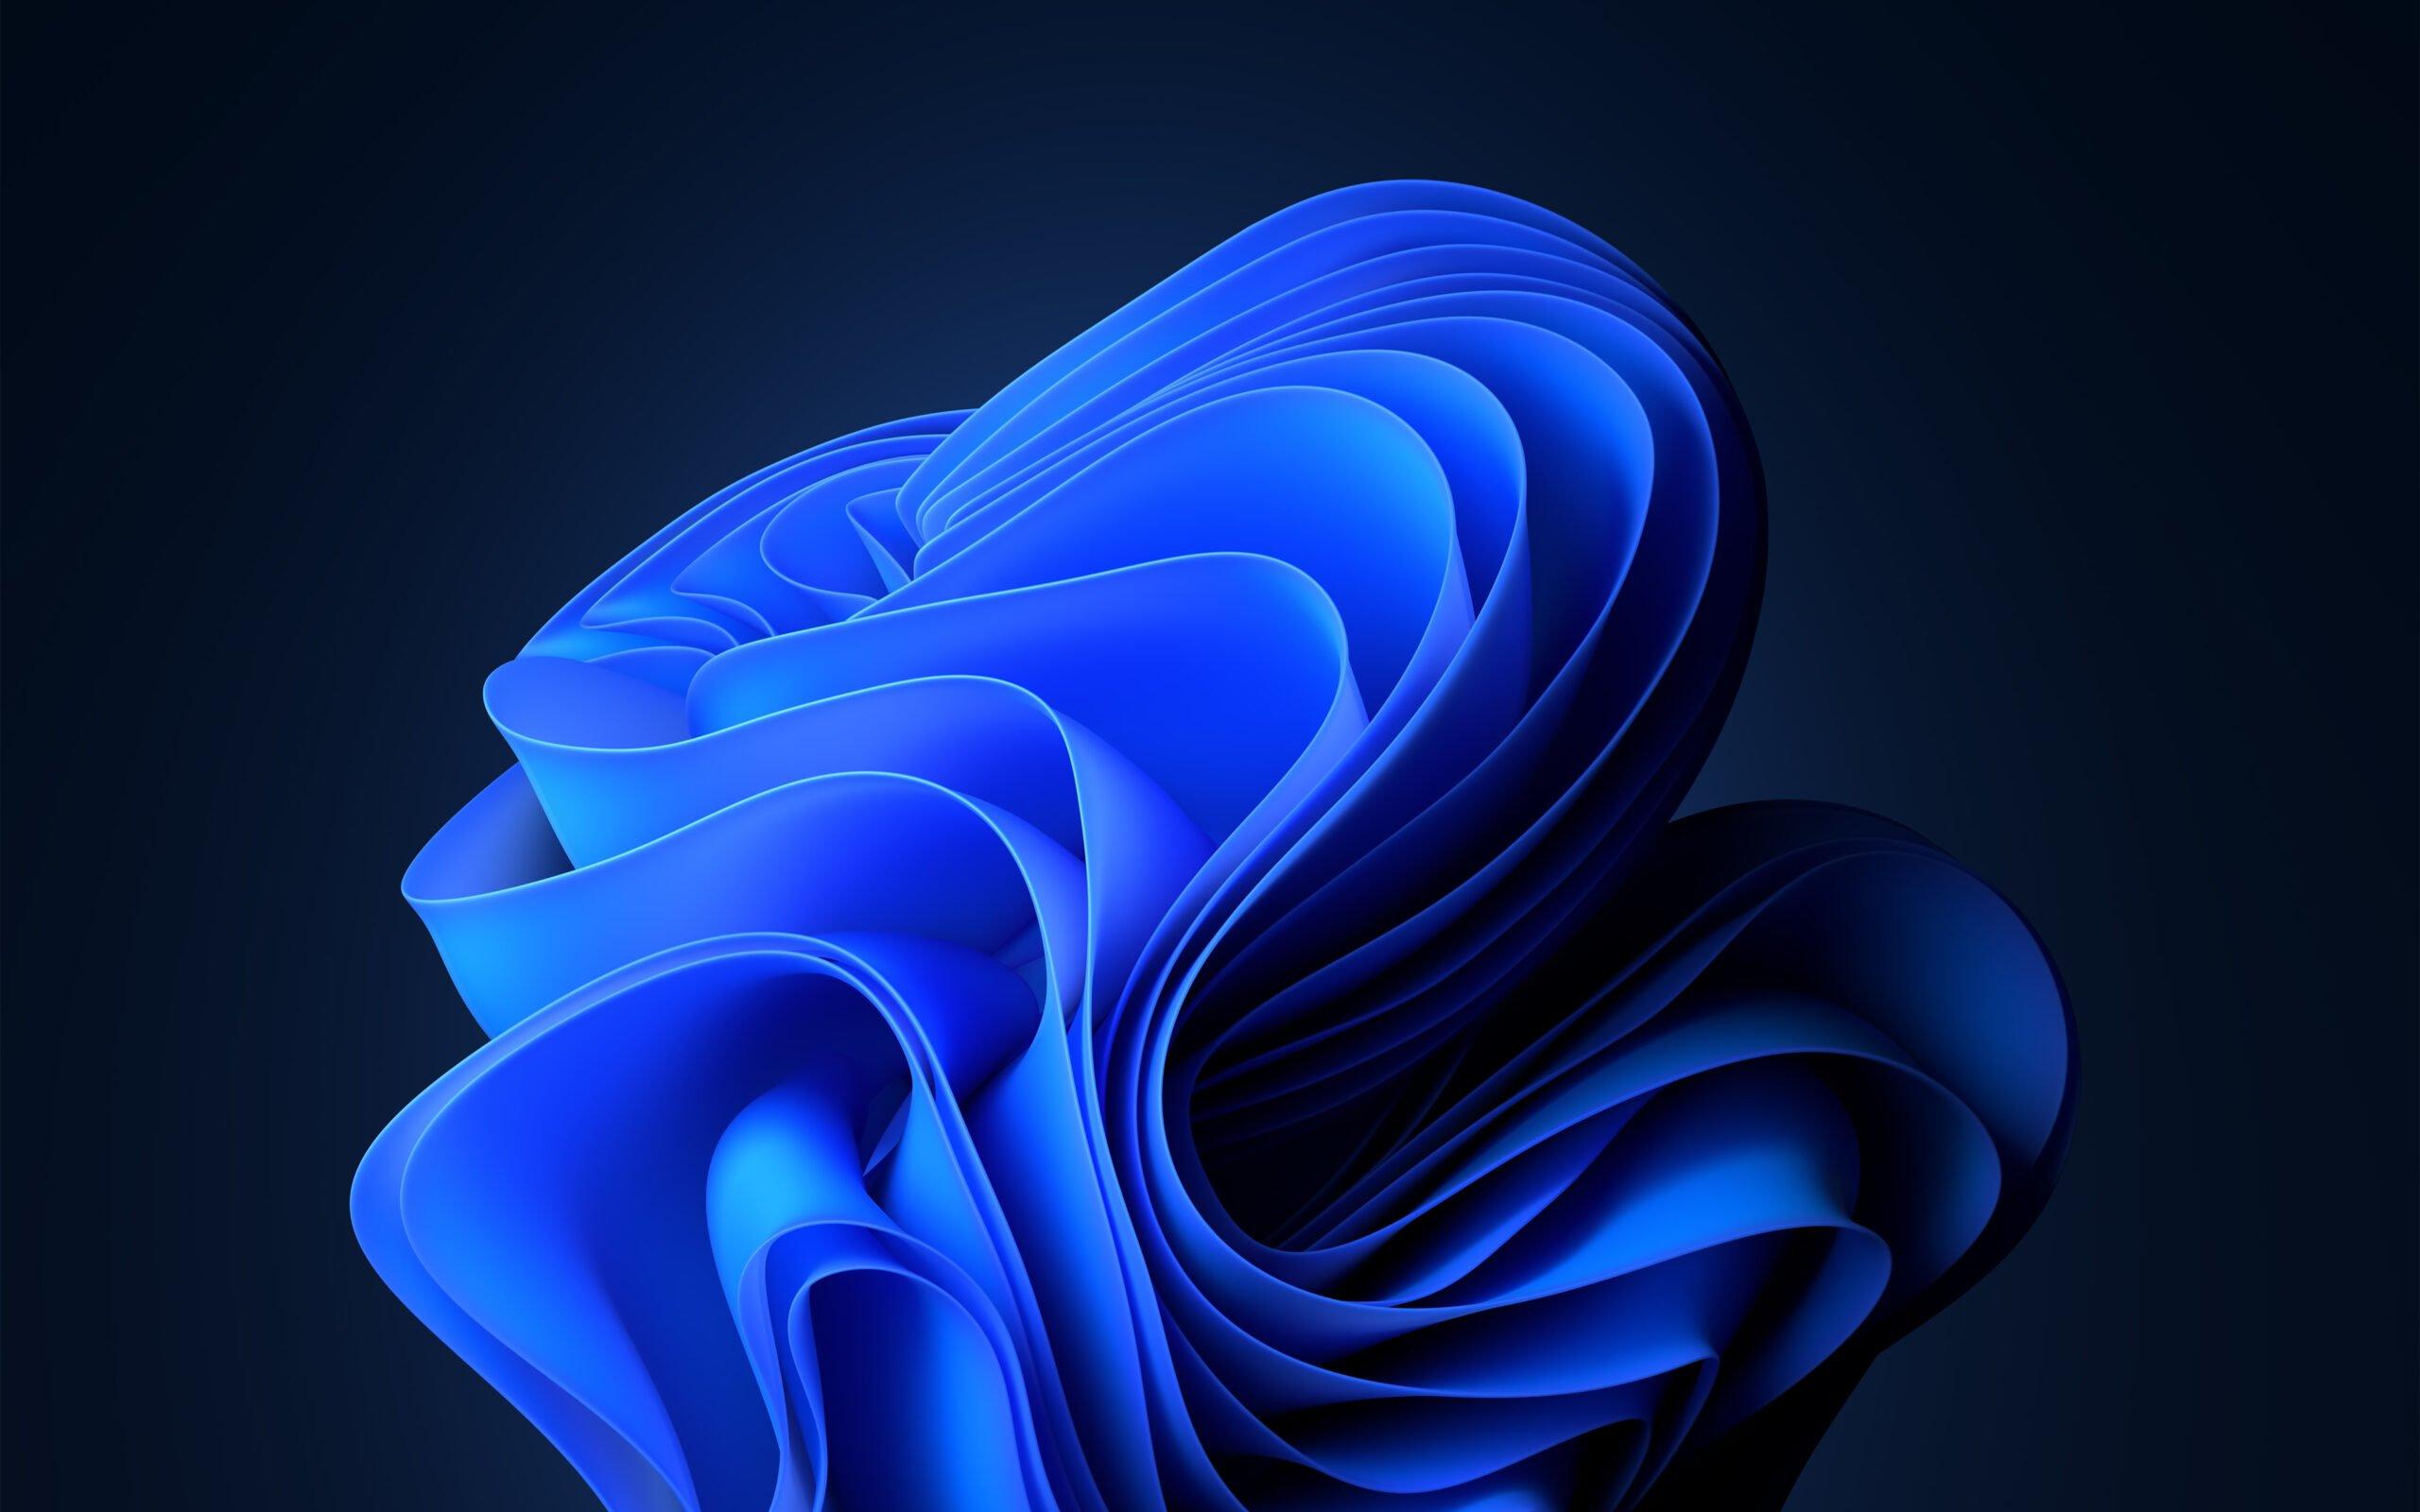 Windows 11 - Bloom Theme Image - Microsoft